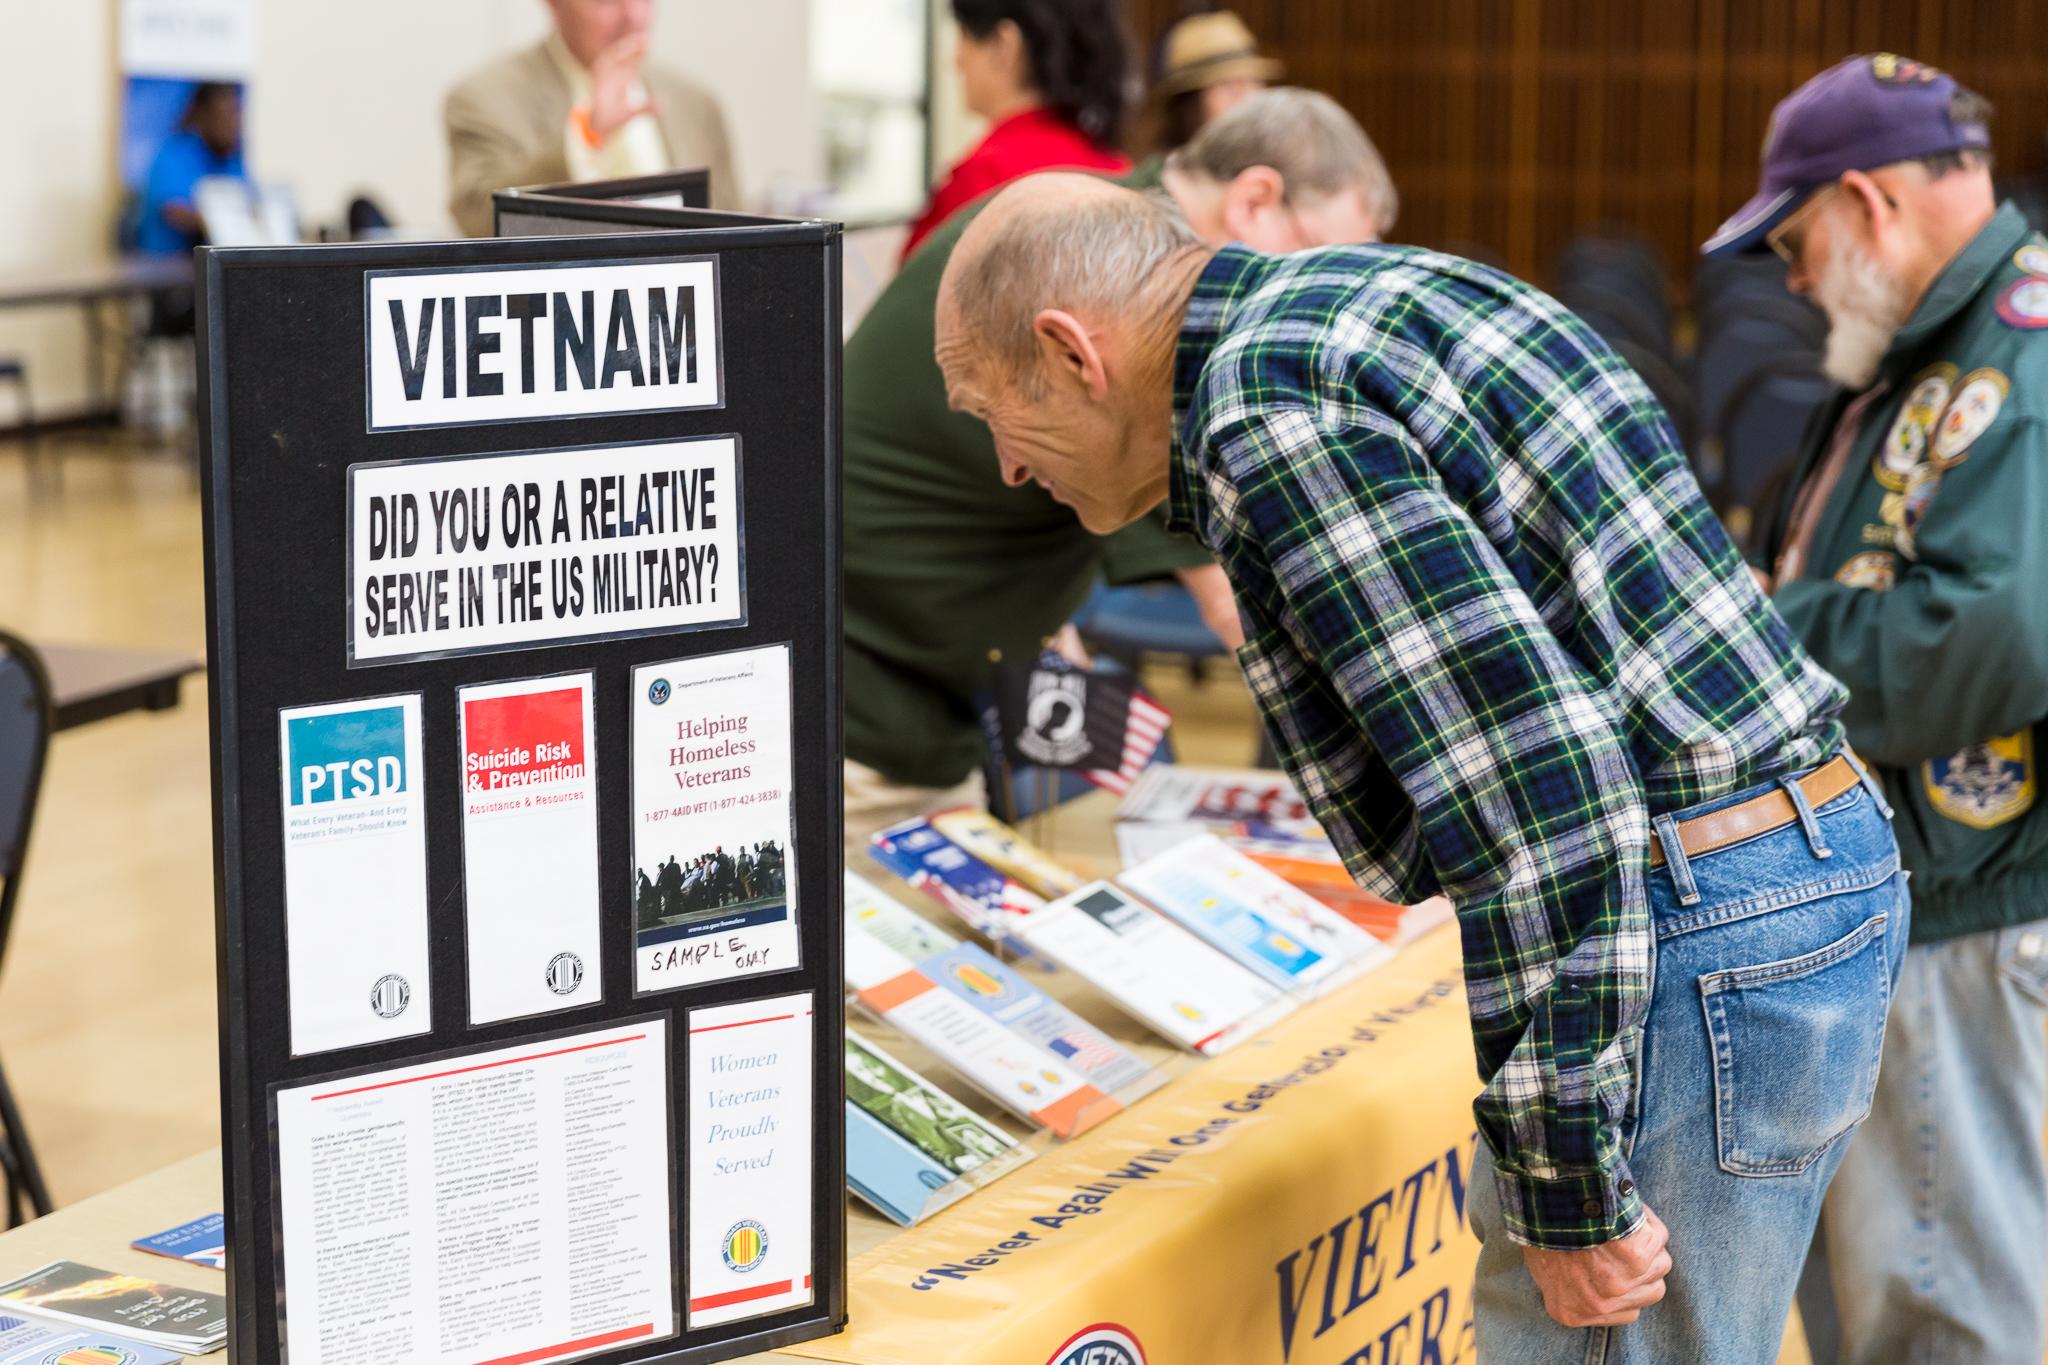 Vietnam Veterans booth